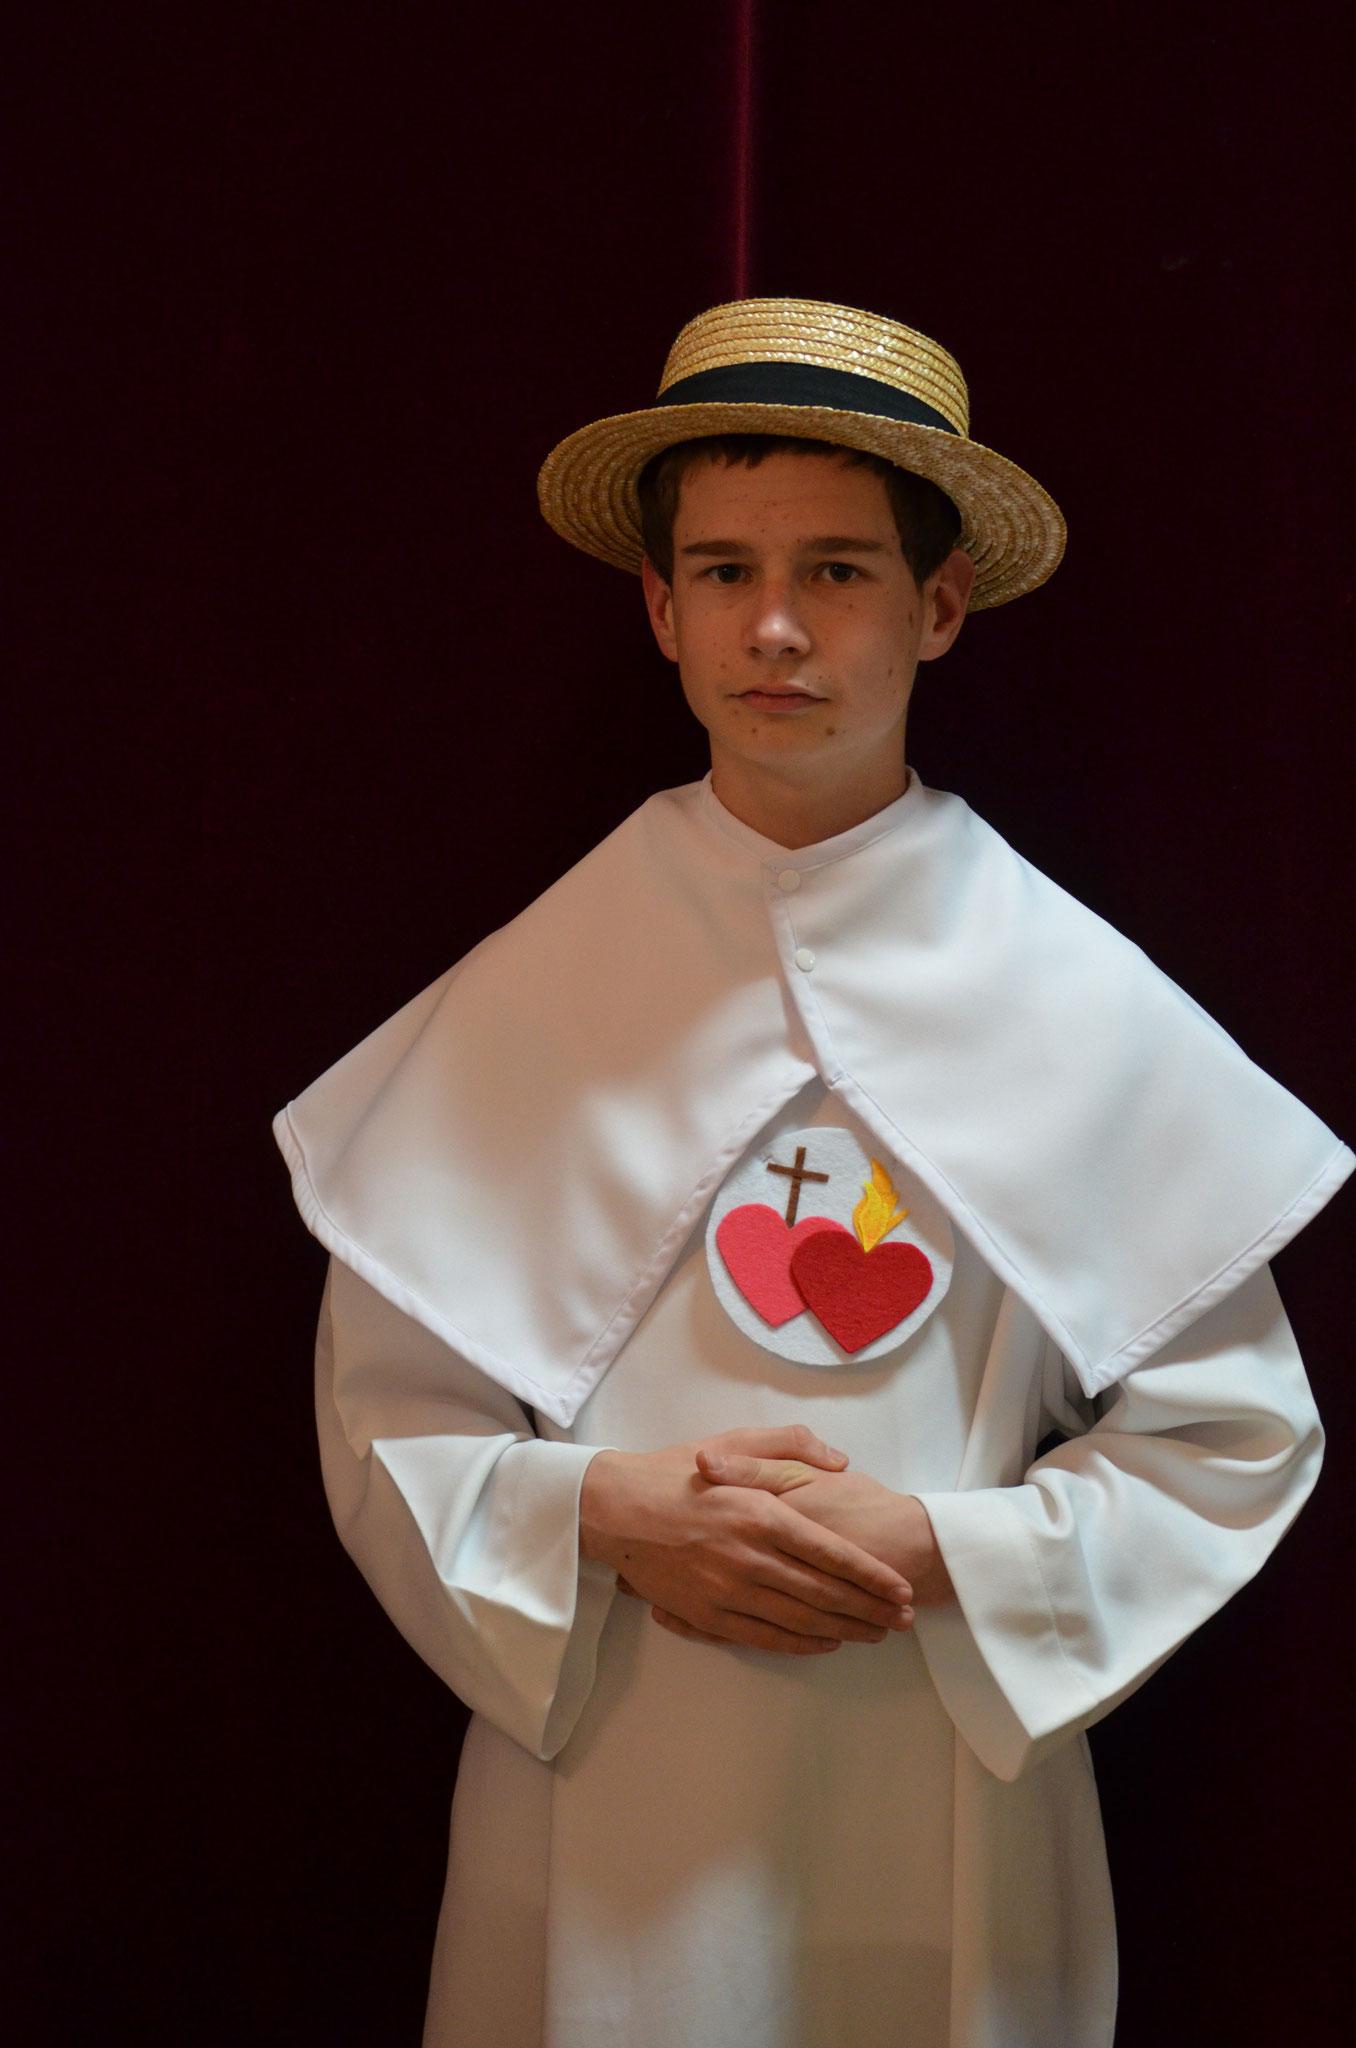 Saint Damien - (c) NR